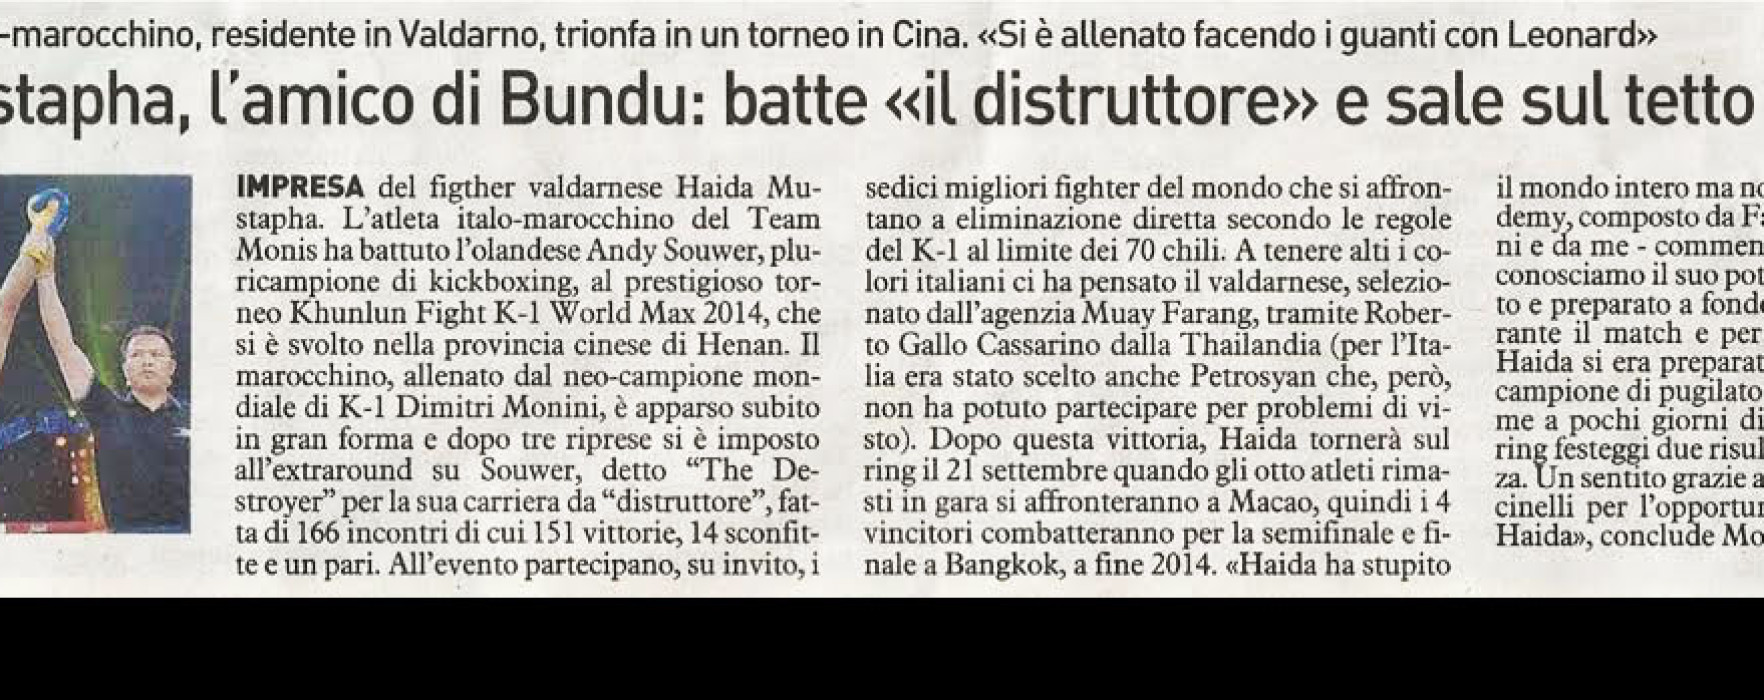 "Flash News: Mustapha Haida & Muay Farang on the Italian Newspaper ""La Nazione"""